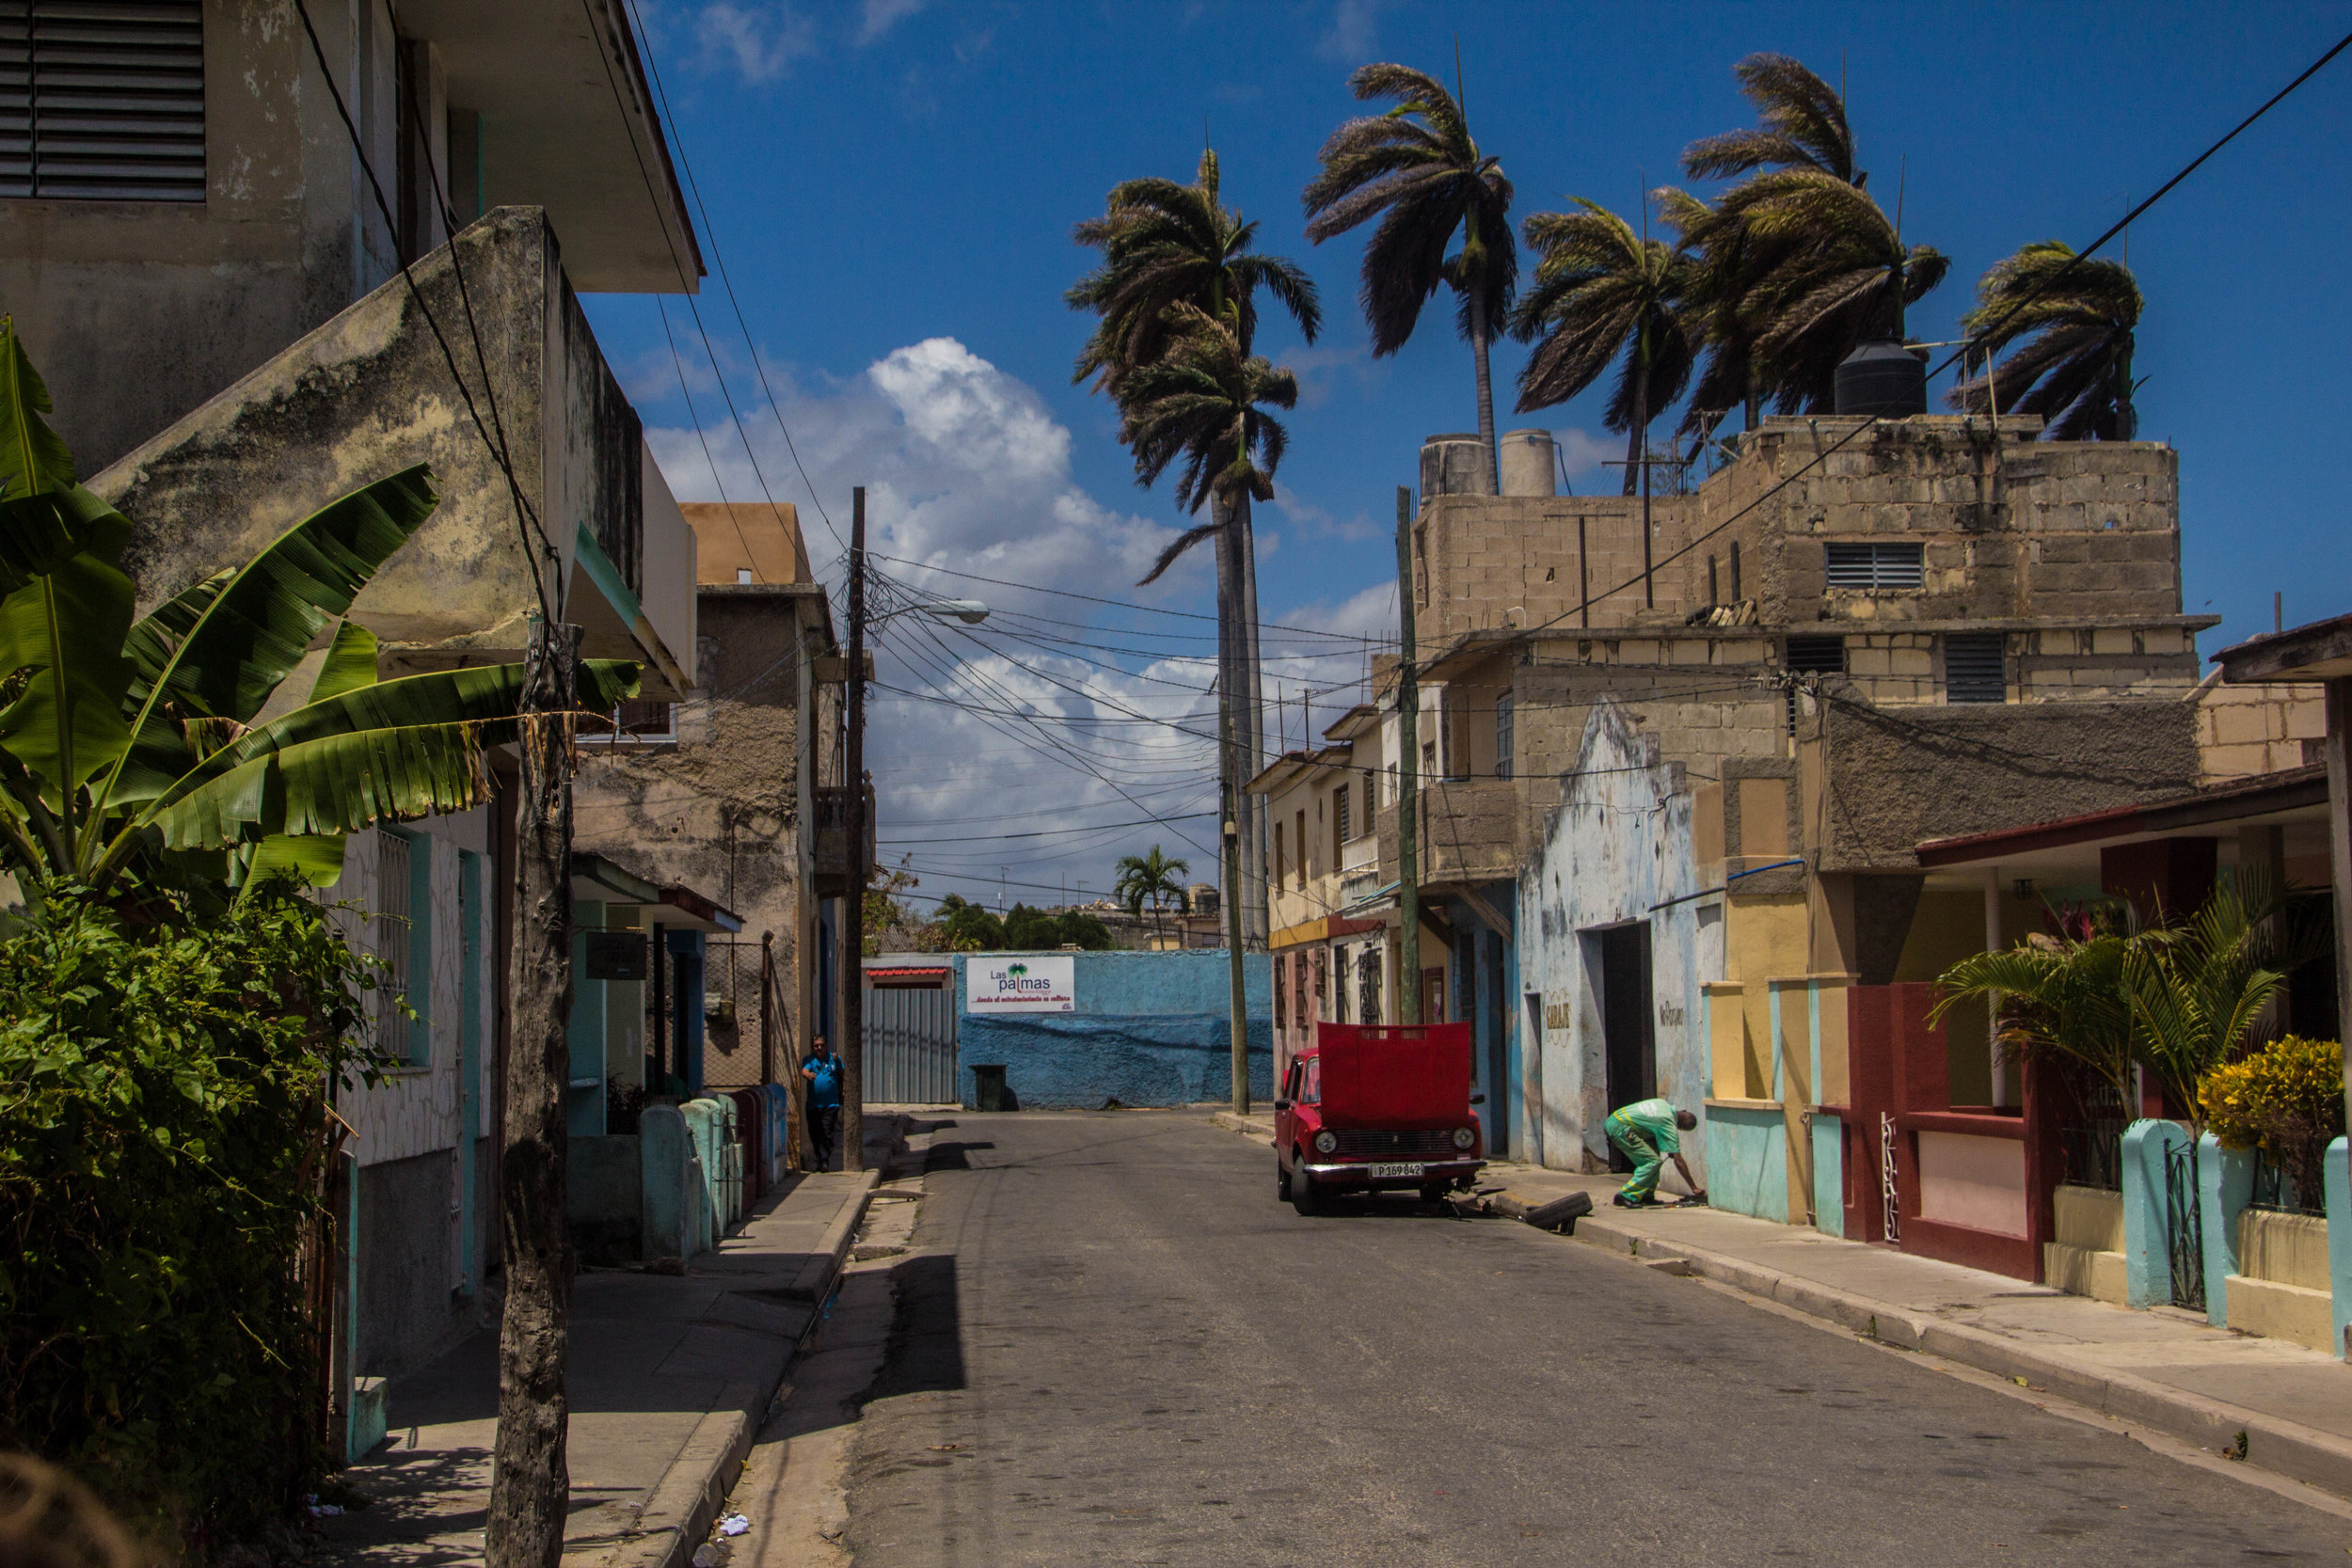 streets matanzas cuba-1-2-2.jpg